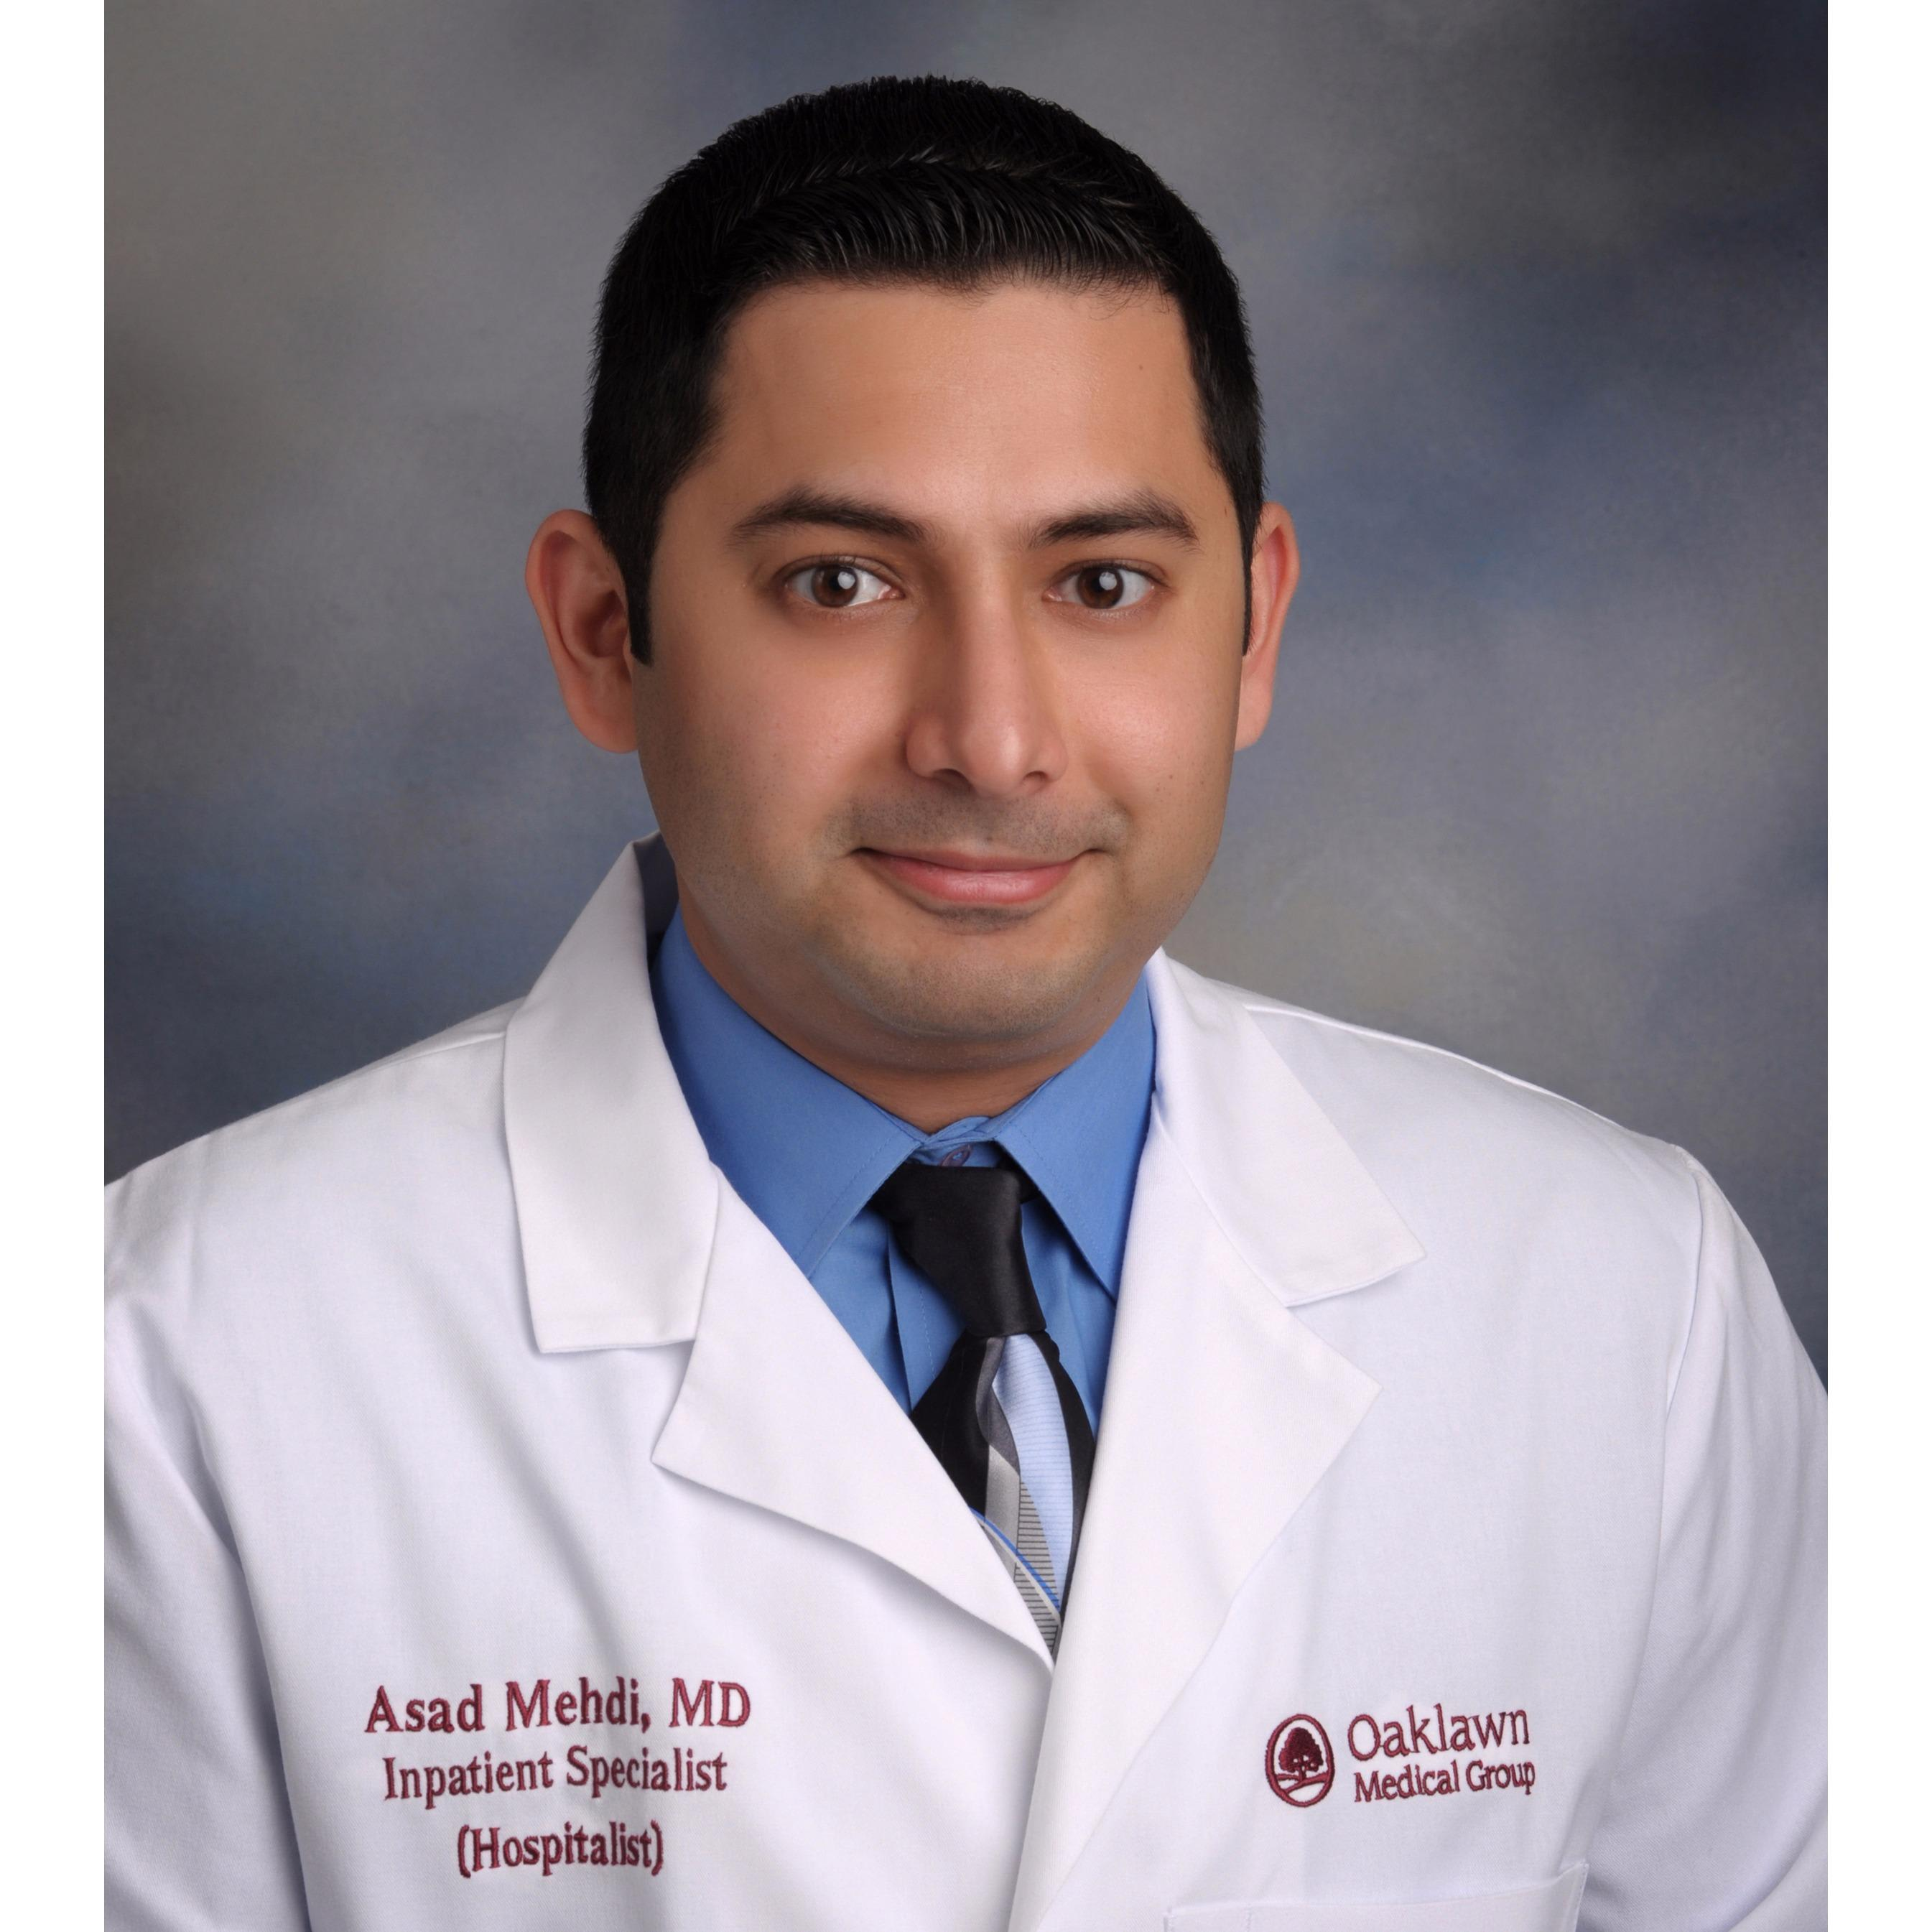 Dr. Asad S Mehdi MD